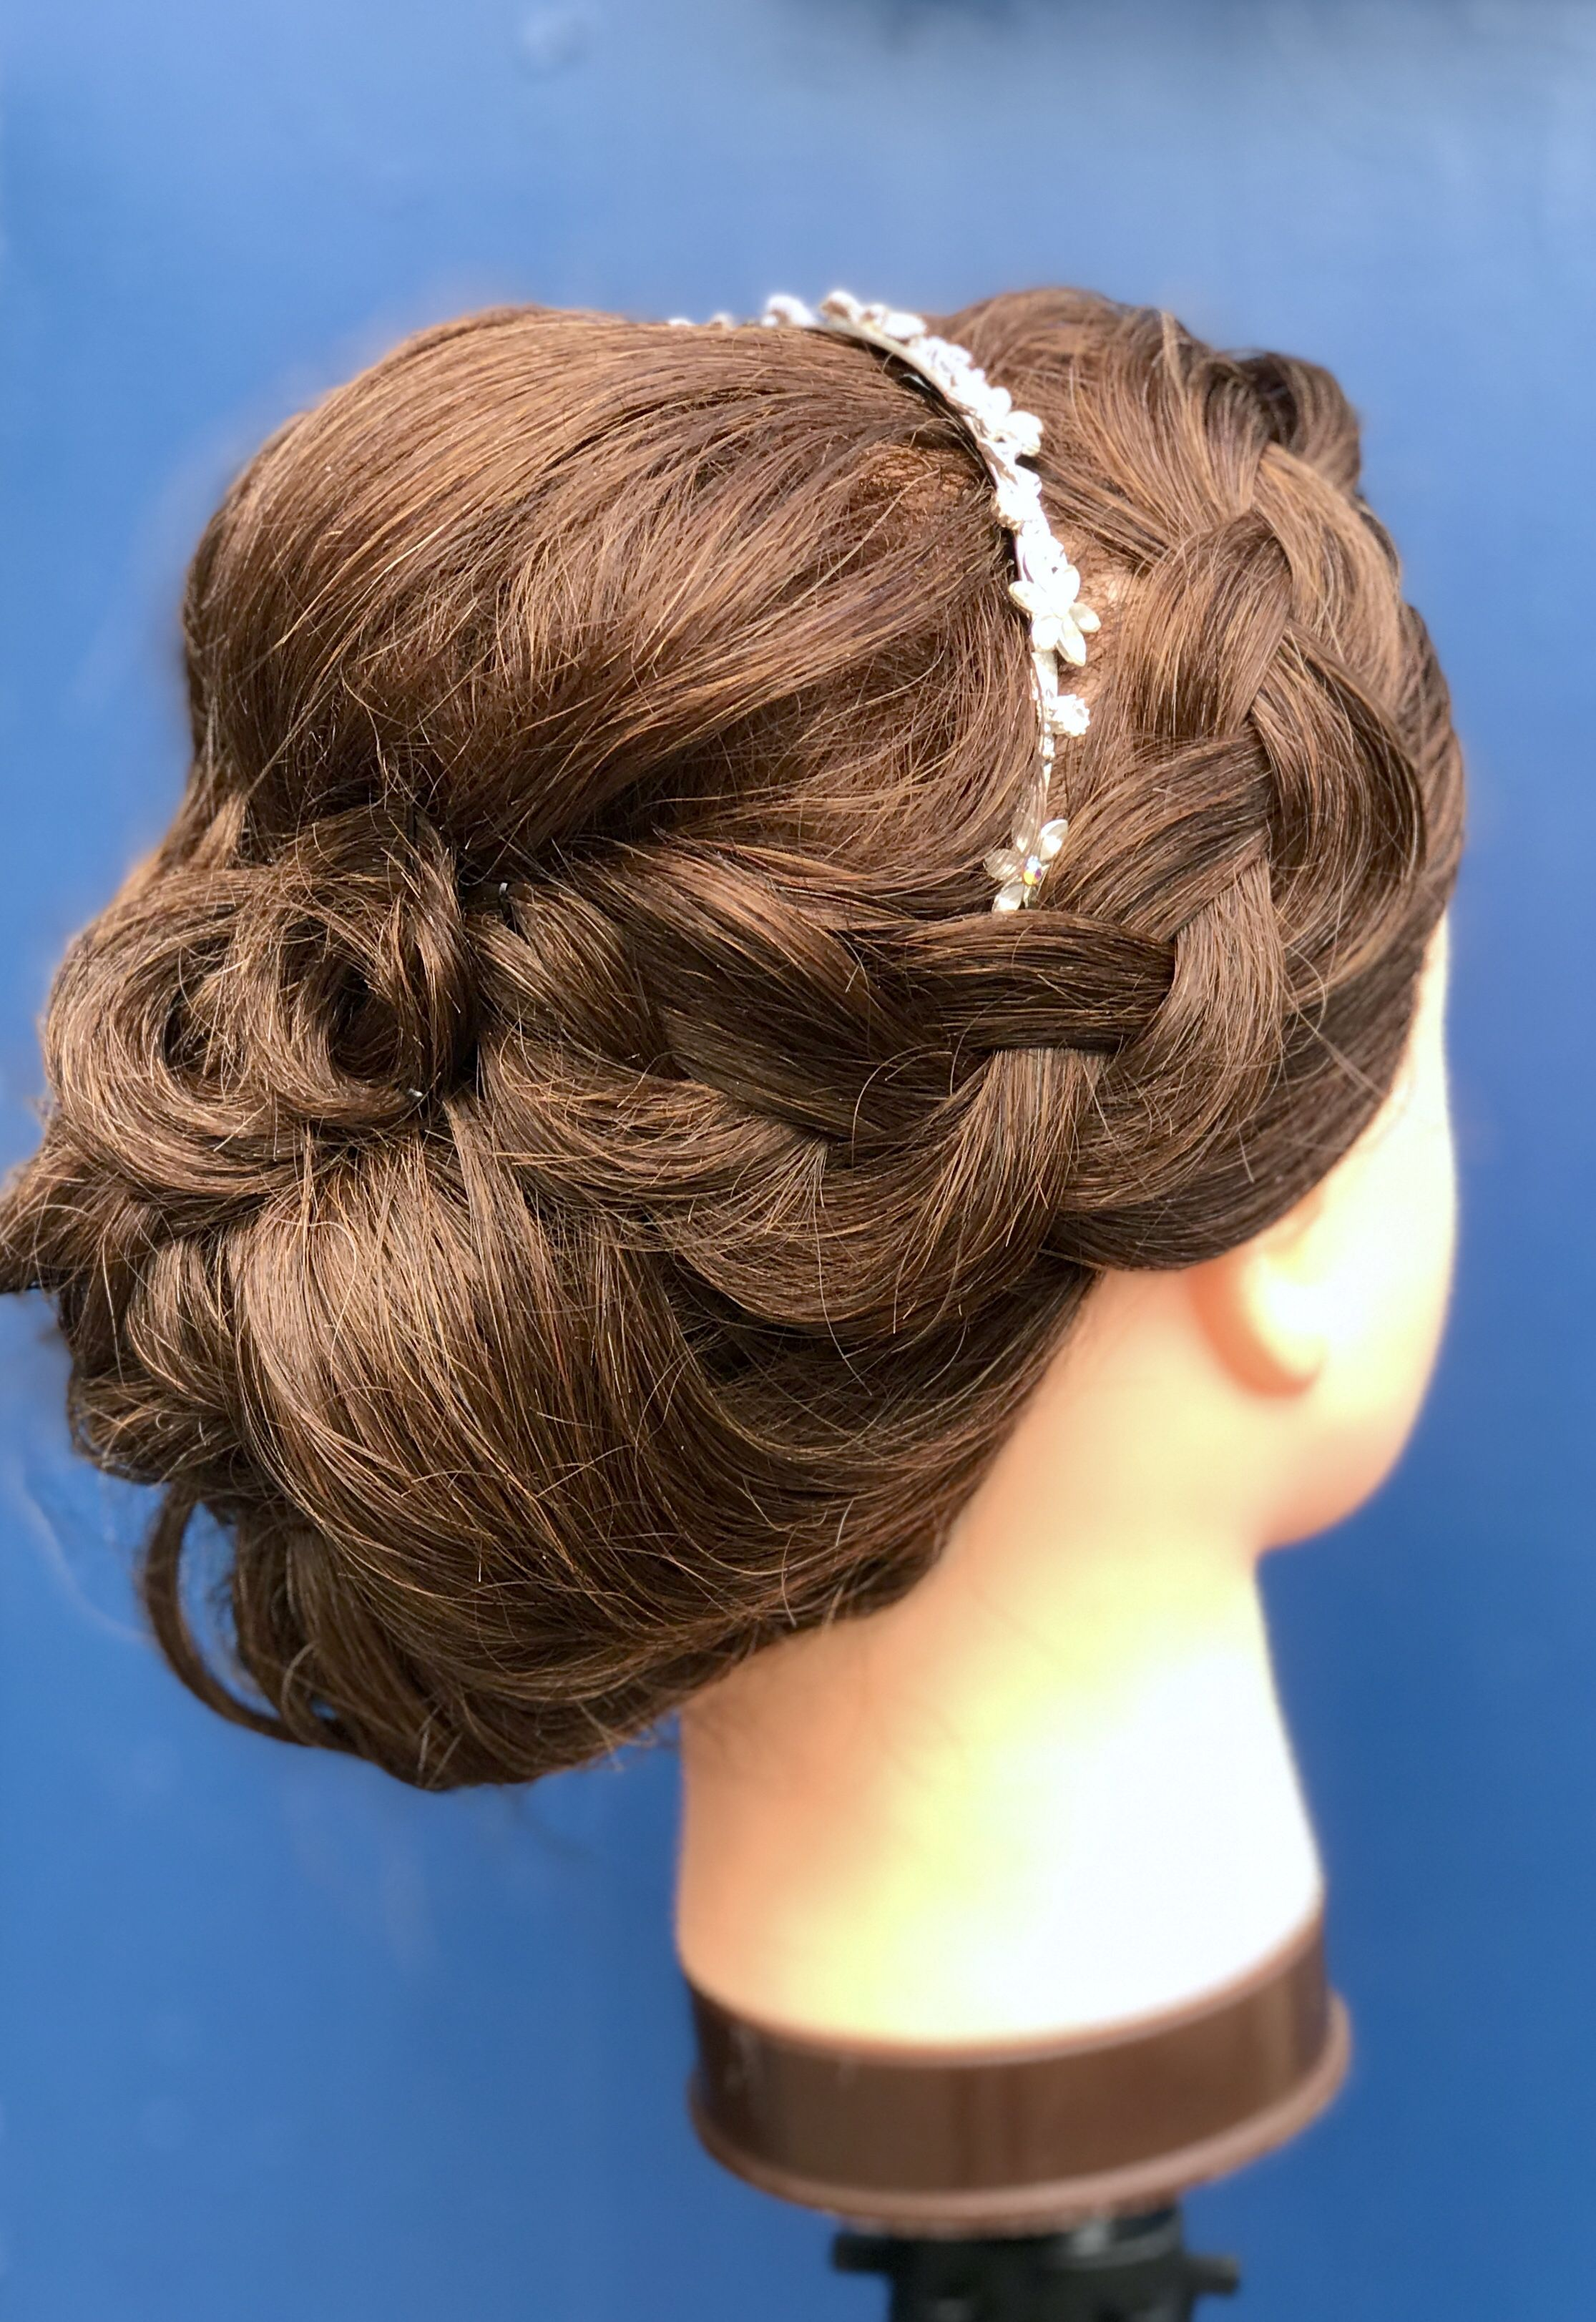 Bridal Hair Styling Courses Course Hair Hair Academy Makeup Course